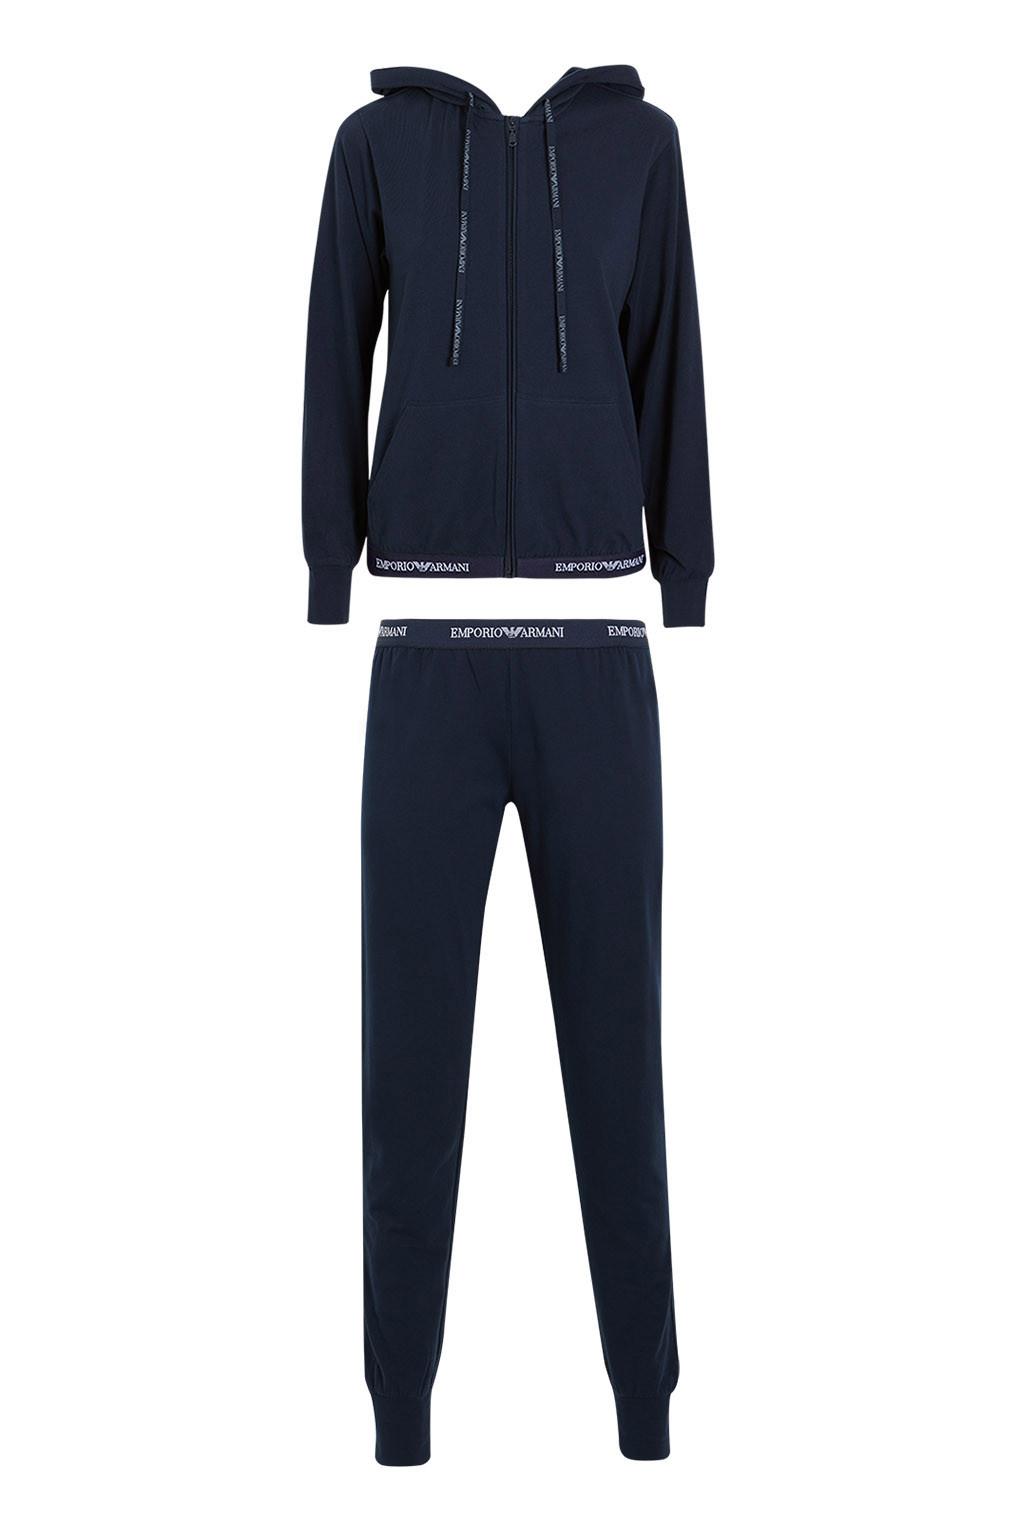 Dámské pyžamo 164145 CC270 00135 modrá - Emporio Armani modrá XL